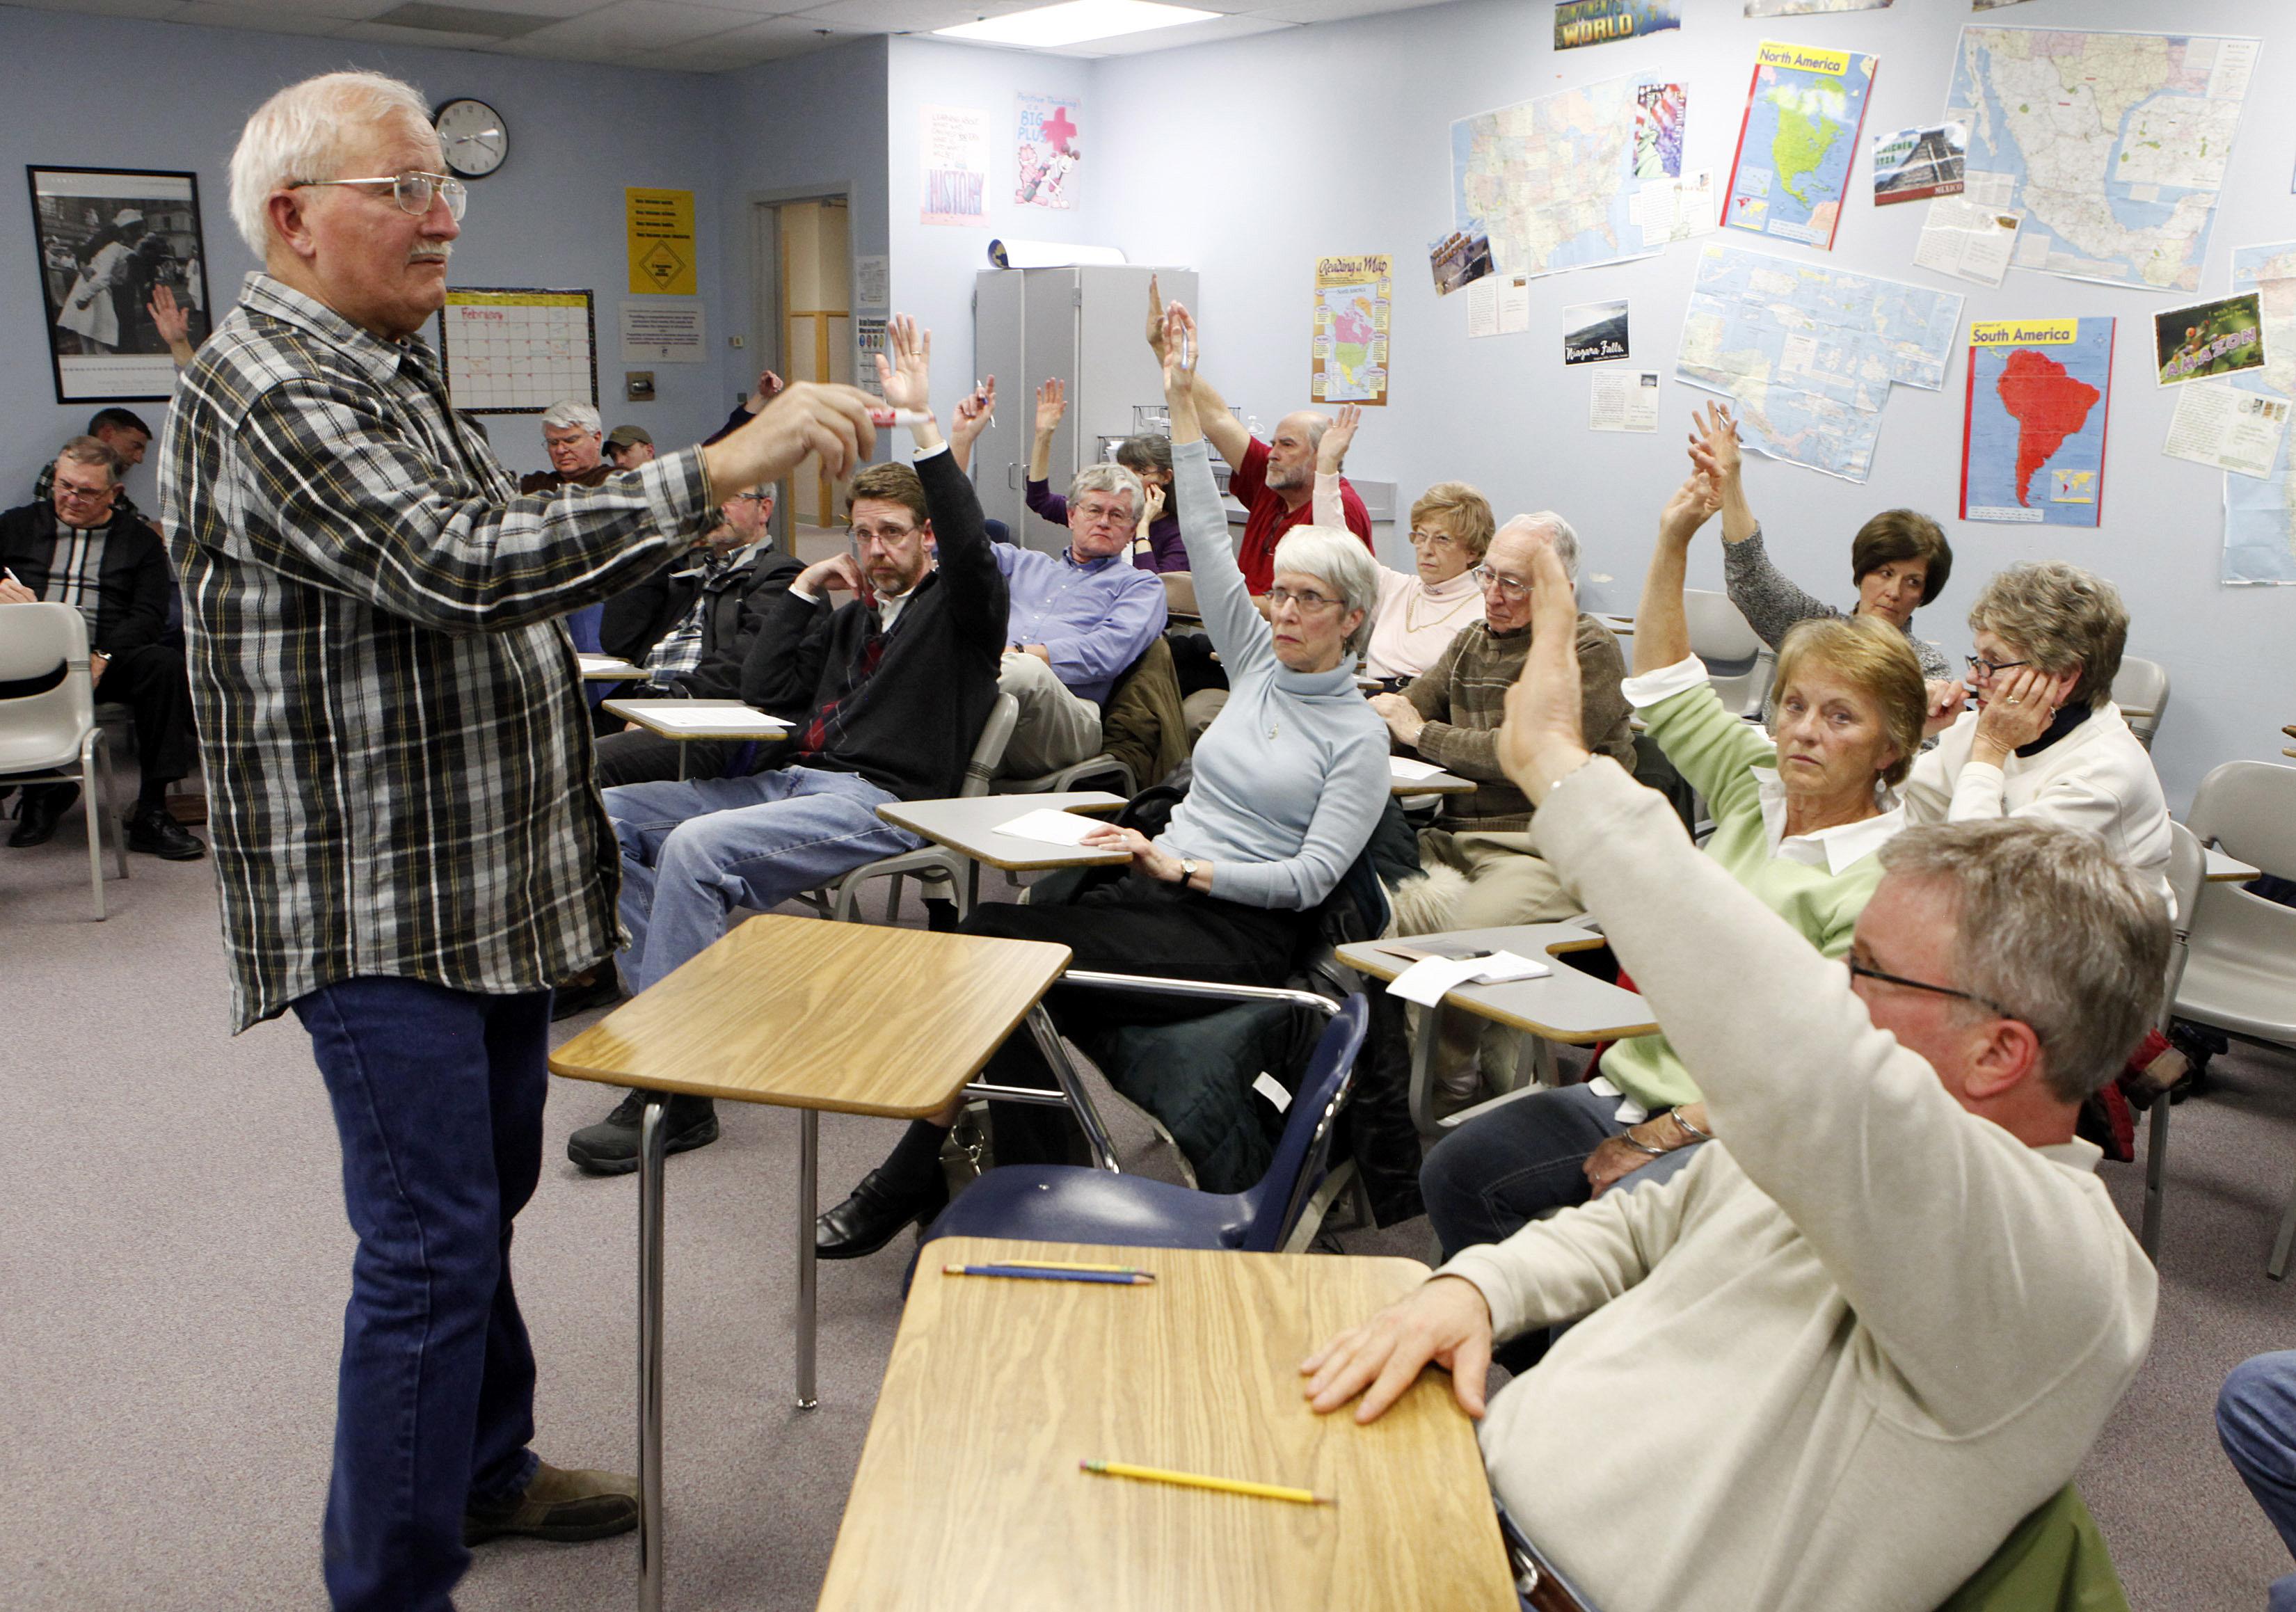 Photo: 2012 GOP caucus (AP Photo)